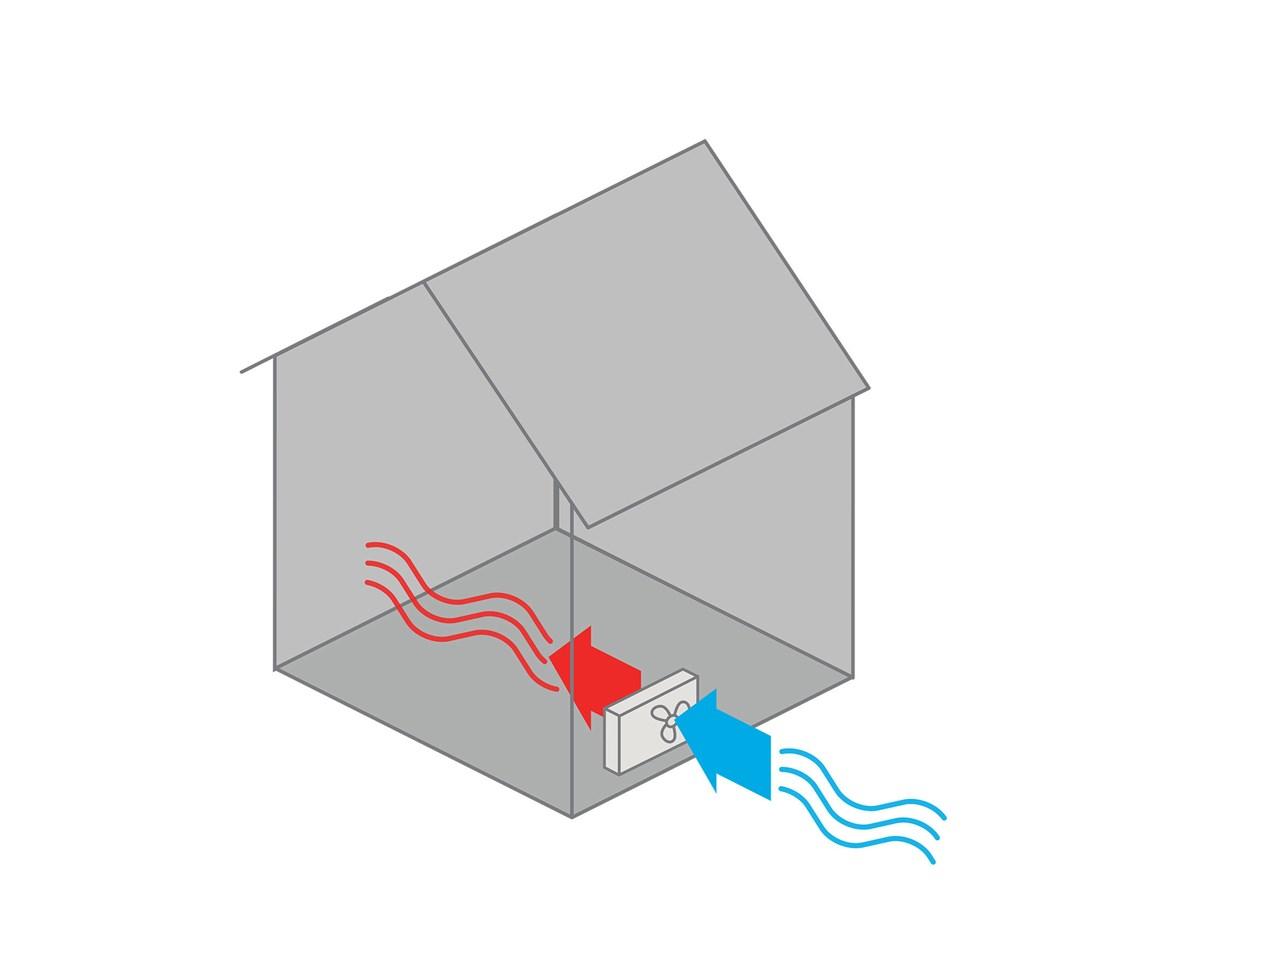 luft vand varmepumpe priser